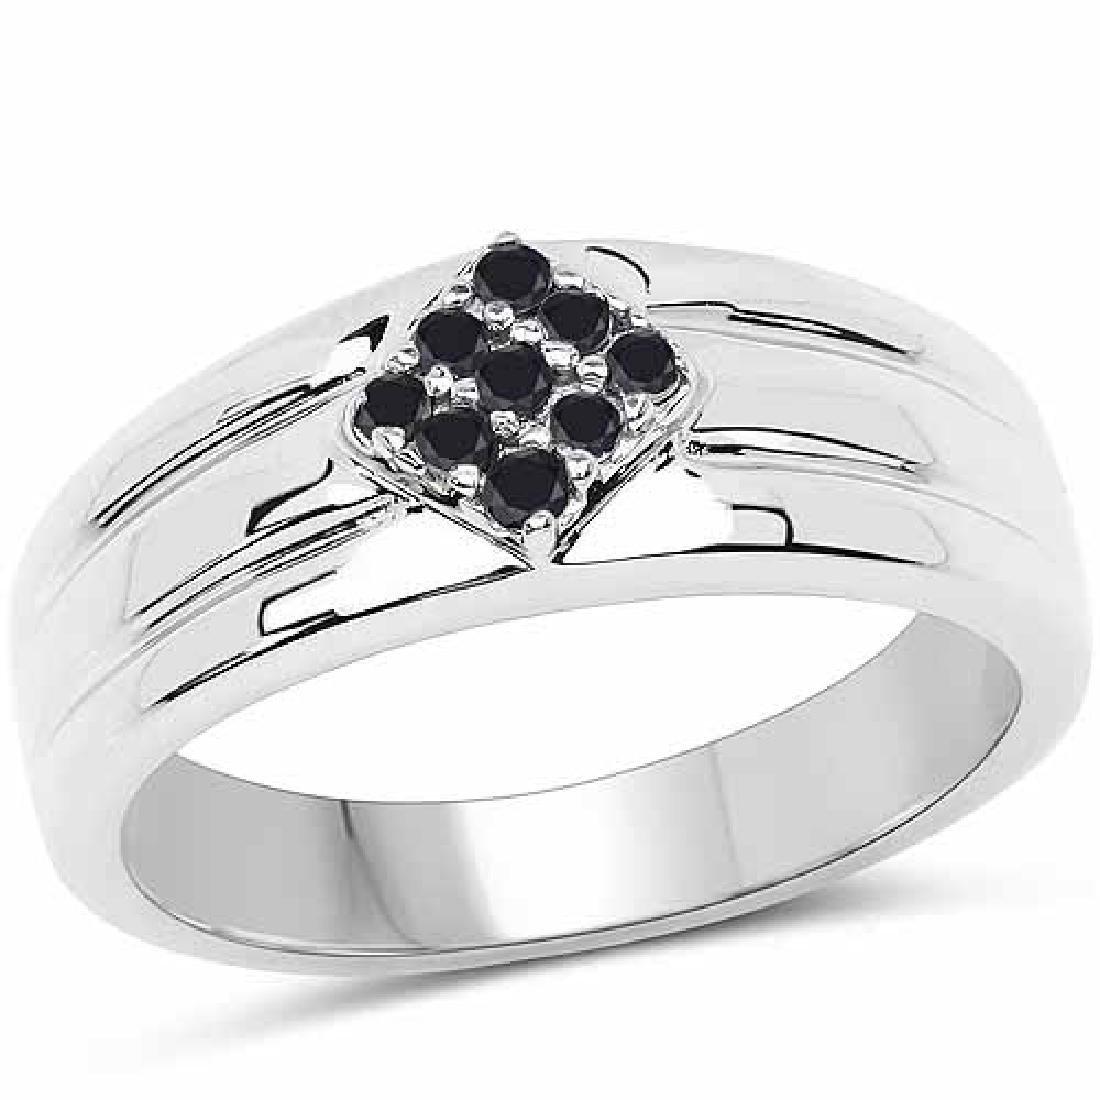 0.14 Carat Genuine Black Diamond .925 Sterling Silver R